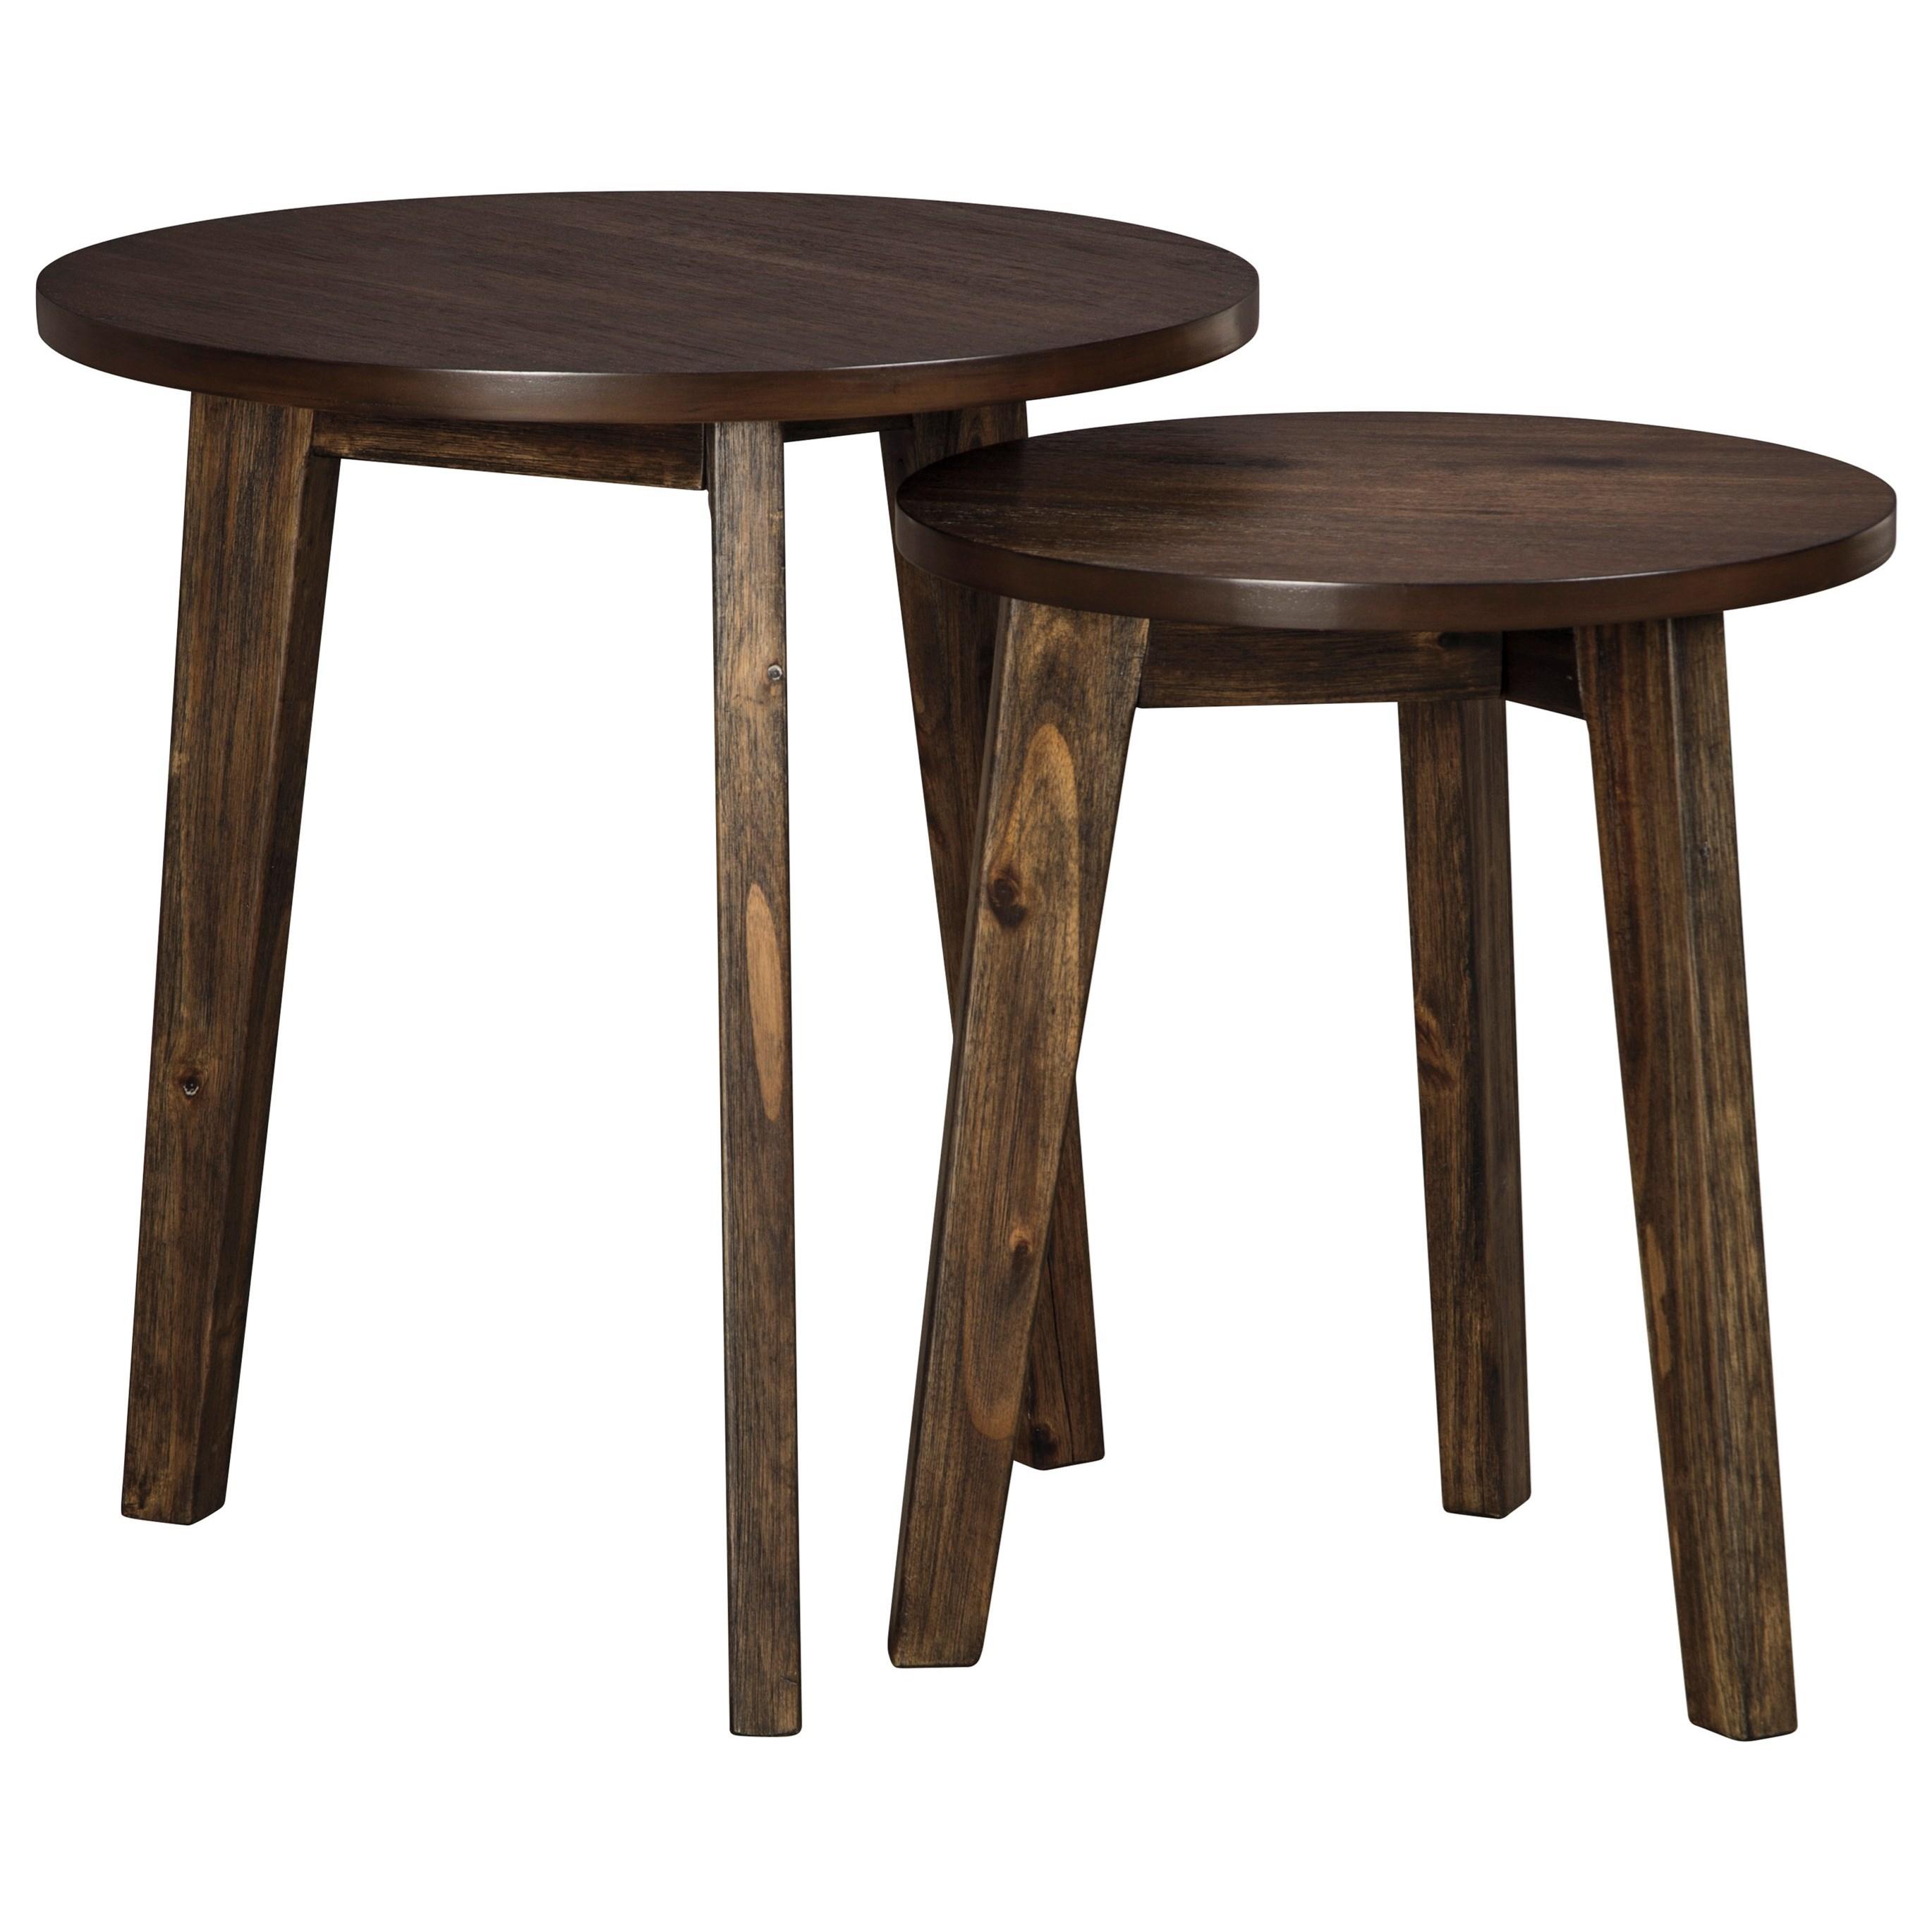 2-Piece Round Accent Table Set